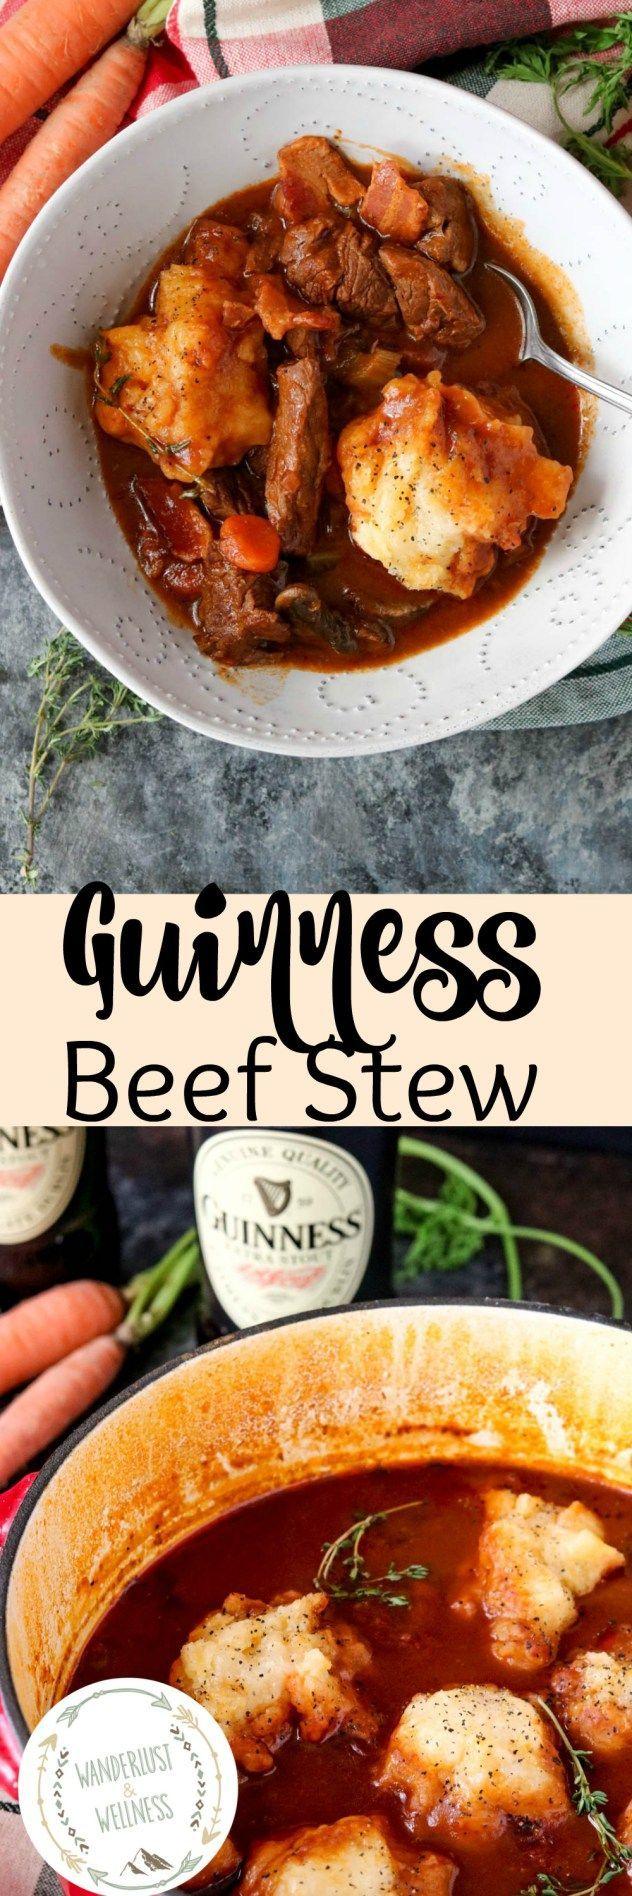 Guinness Beef Stew with Gluten-free Garlic Cheddar Dumplings: